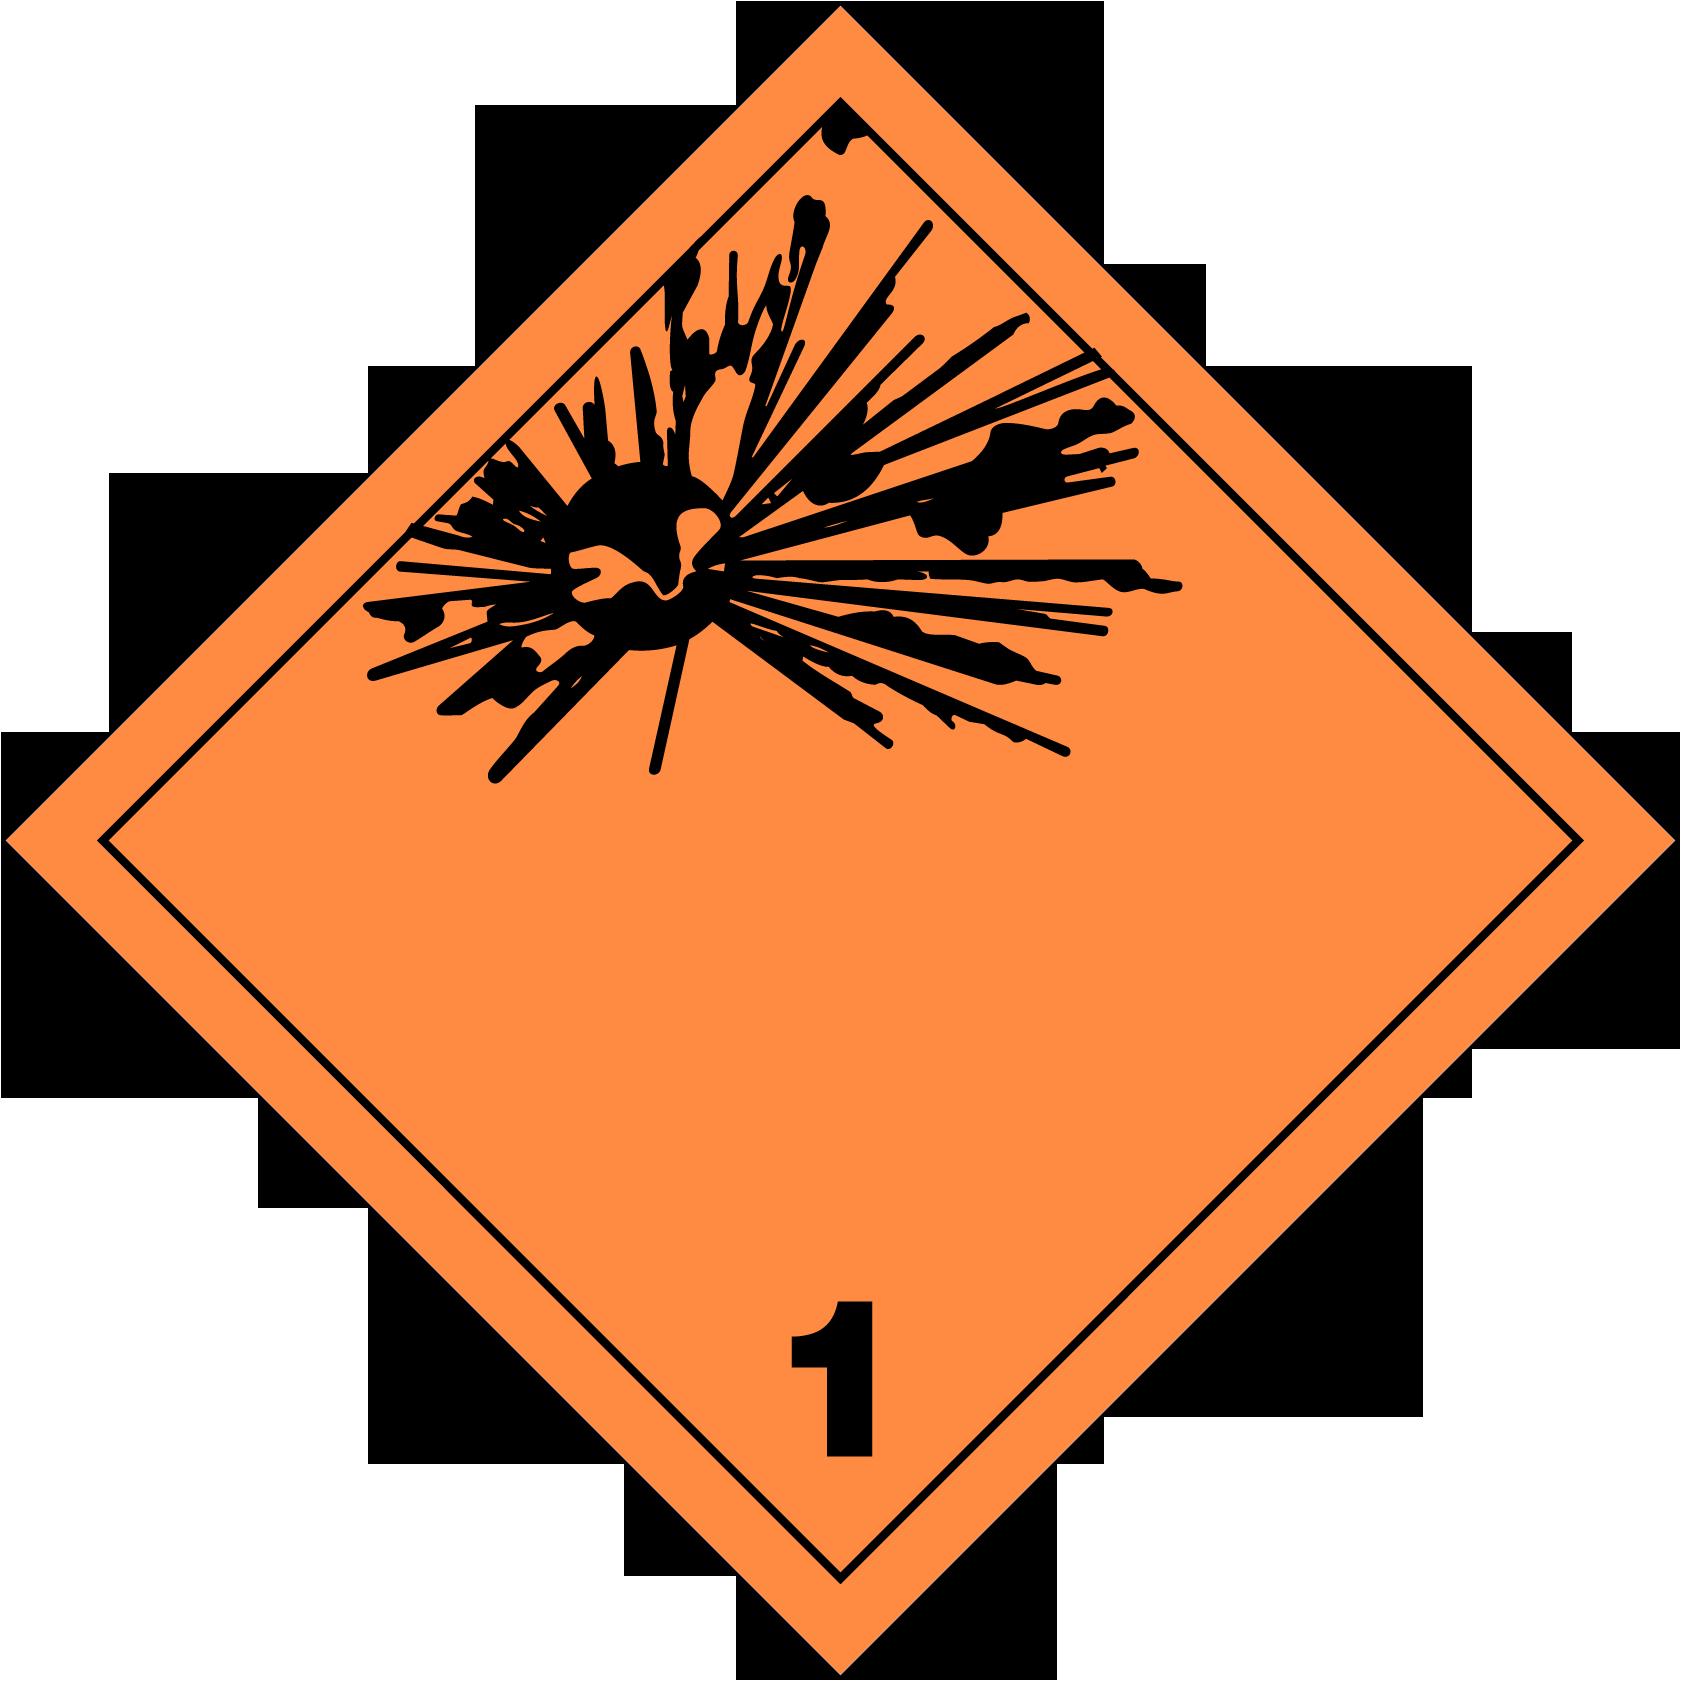 U S Dot Hazardous Material Labels And Placards Risk Management